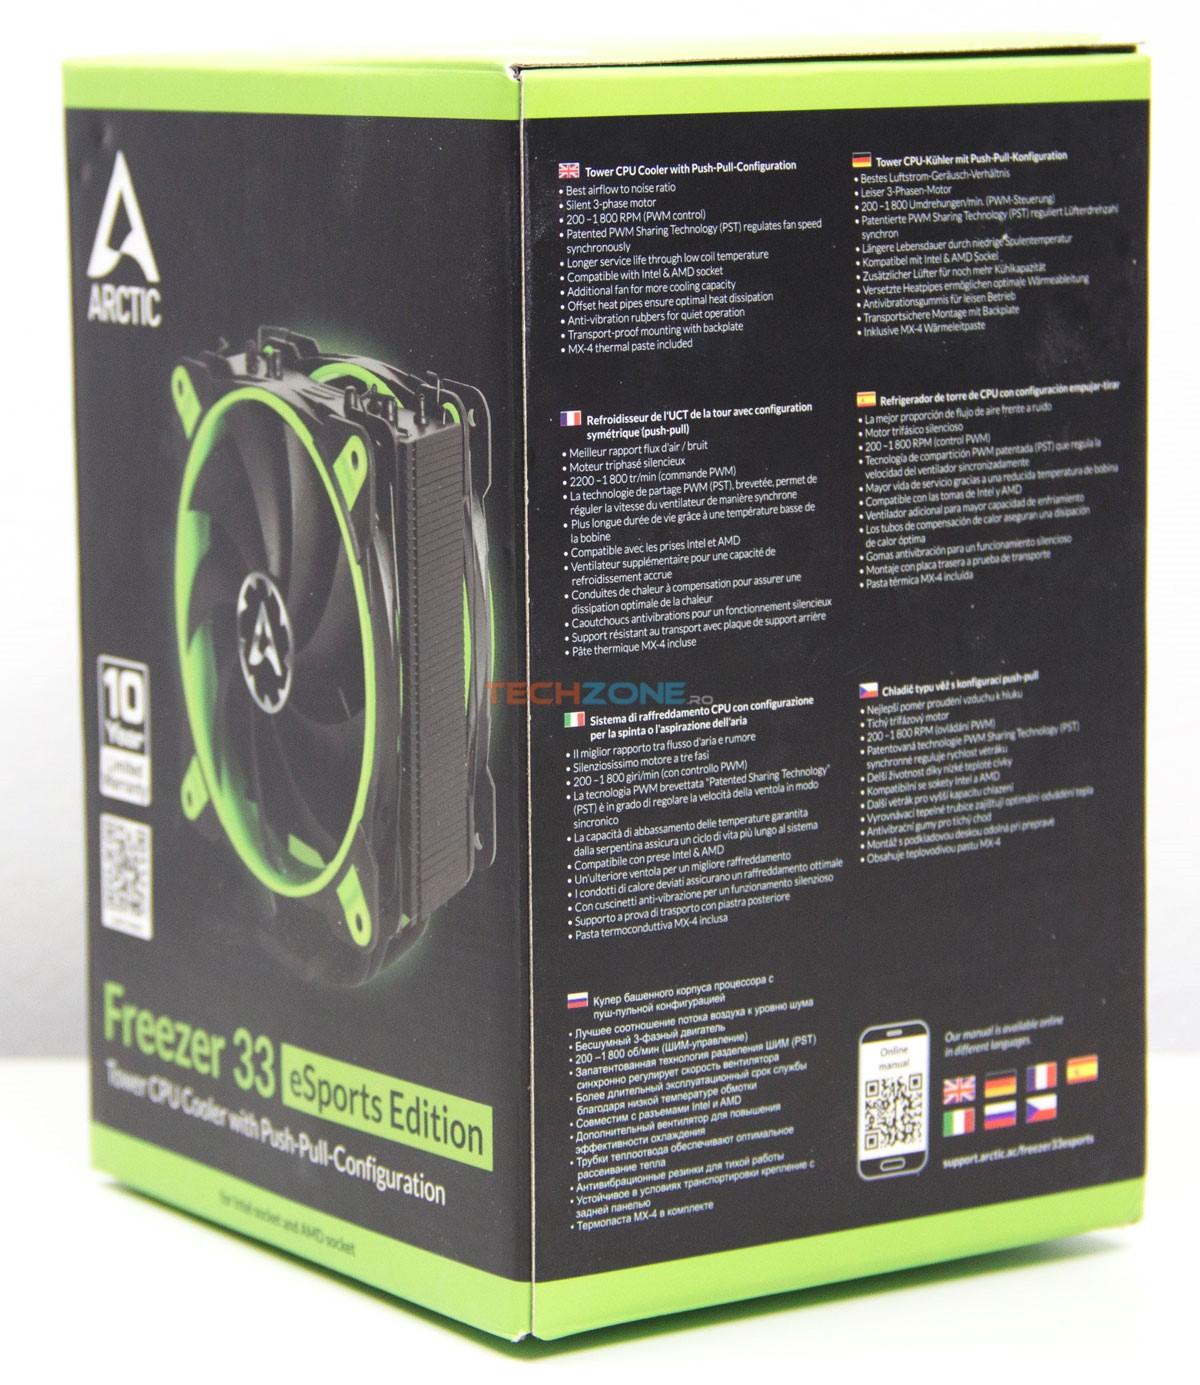 Arctic Freezer33 eSports box right